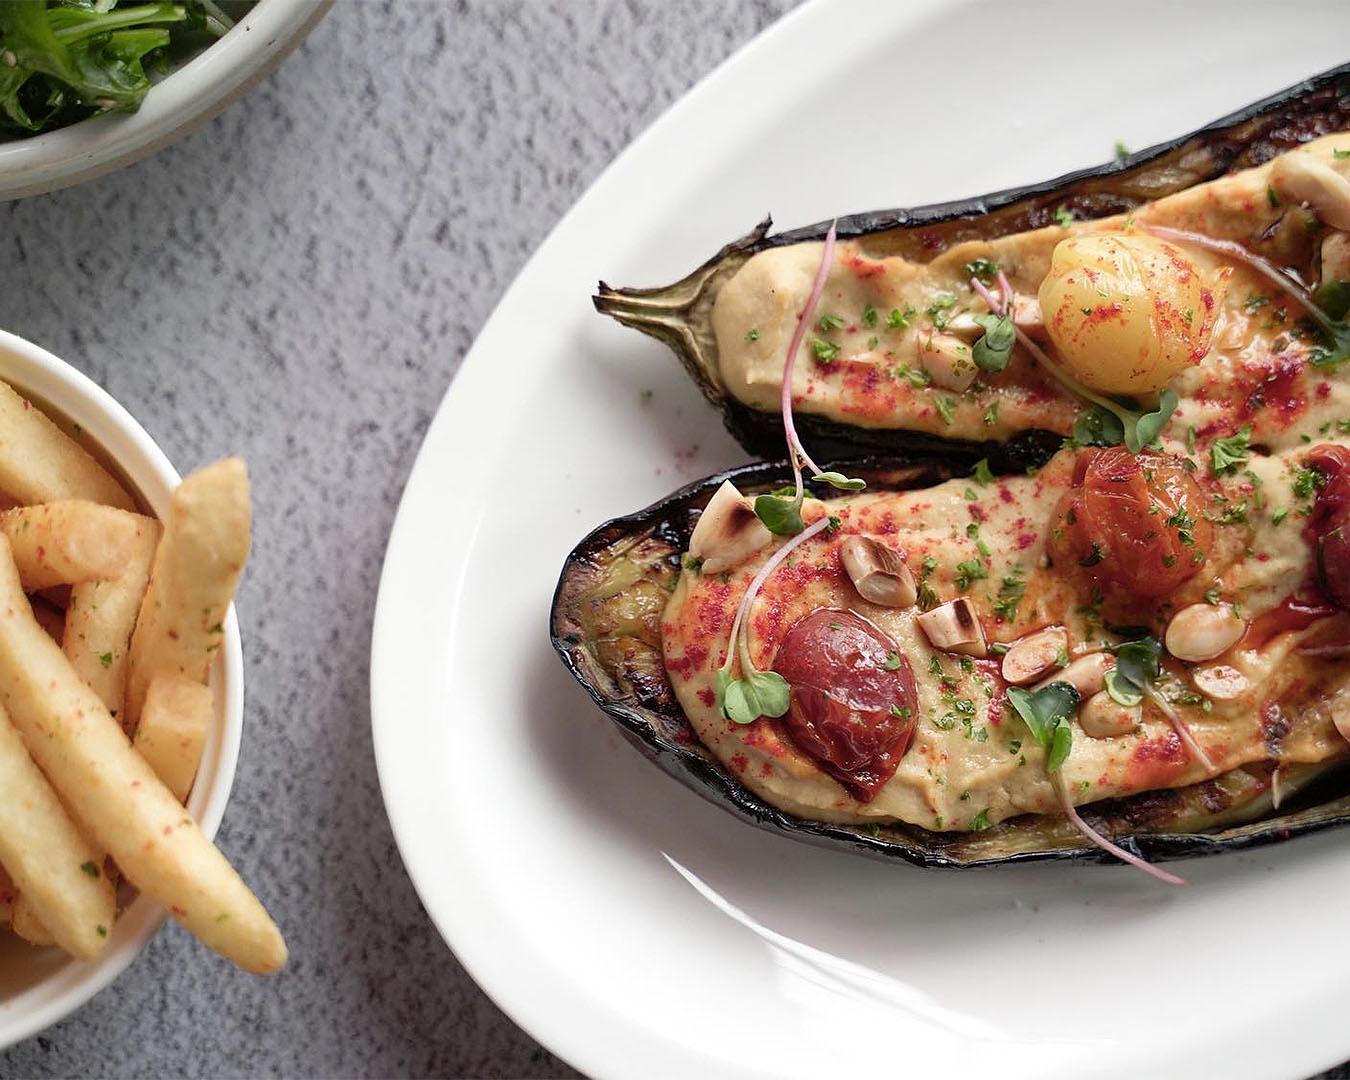 A delicious looking eggplant dish at Castros.